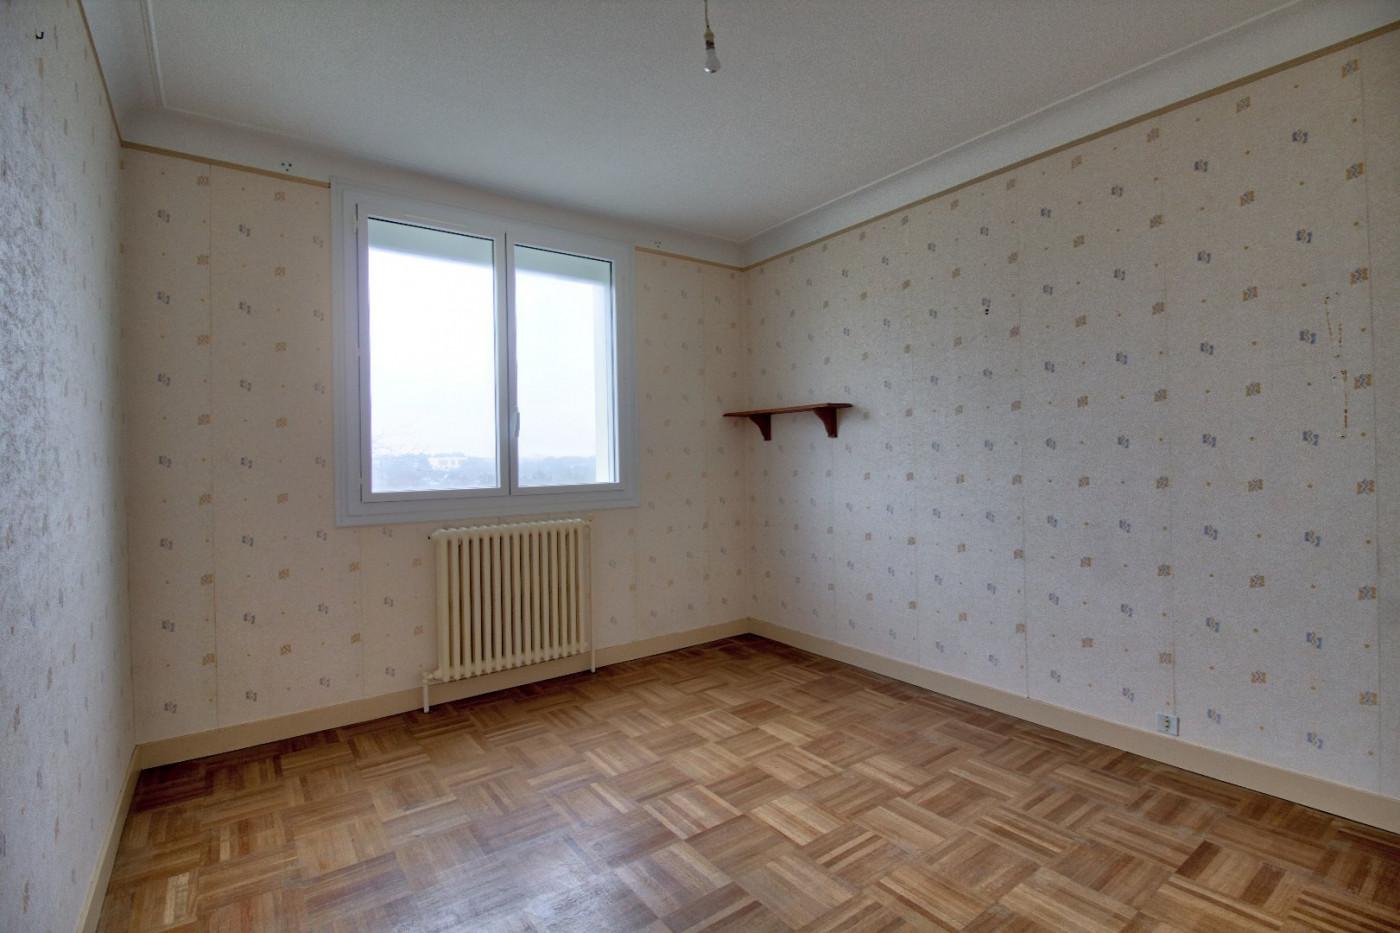 A vendre Chateaubriant 44015538 Agence porte neuve immobilier